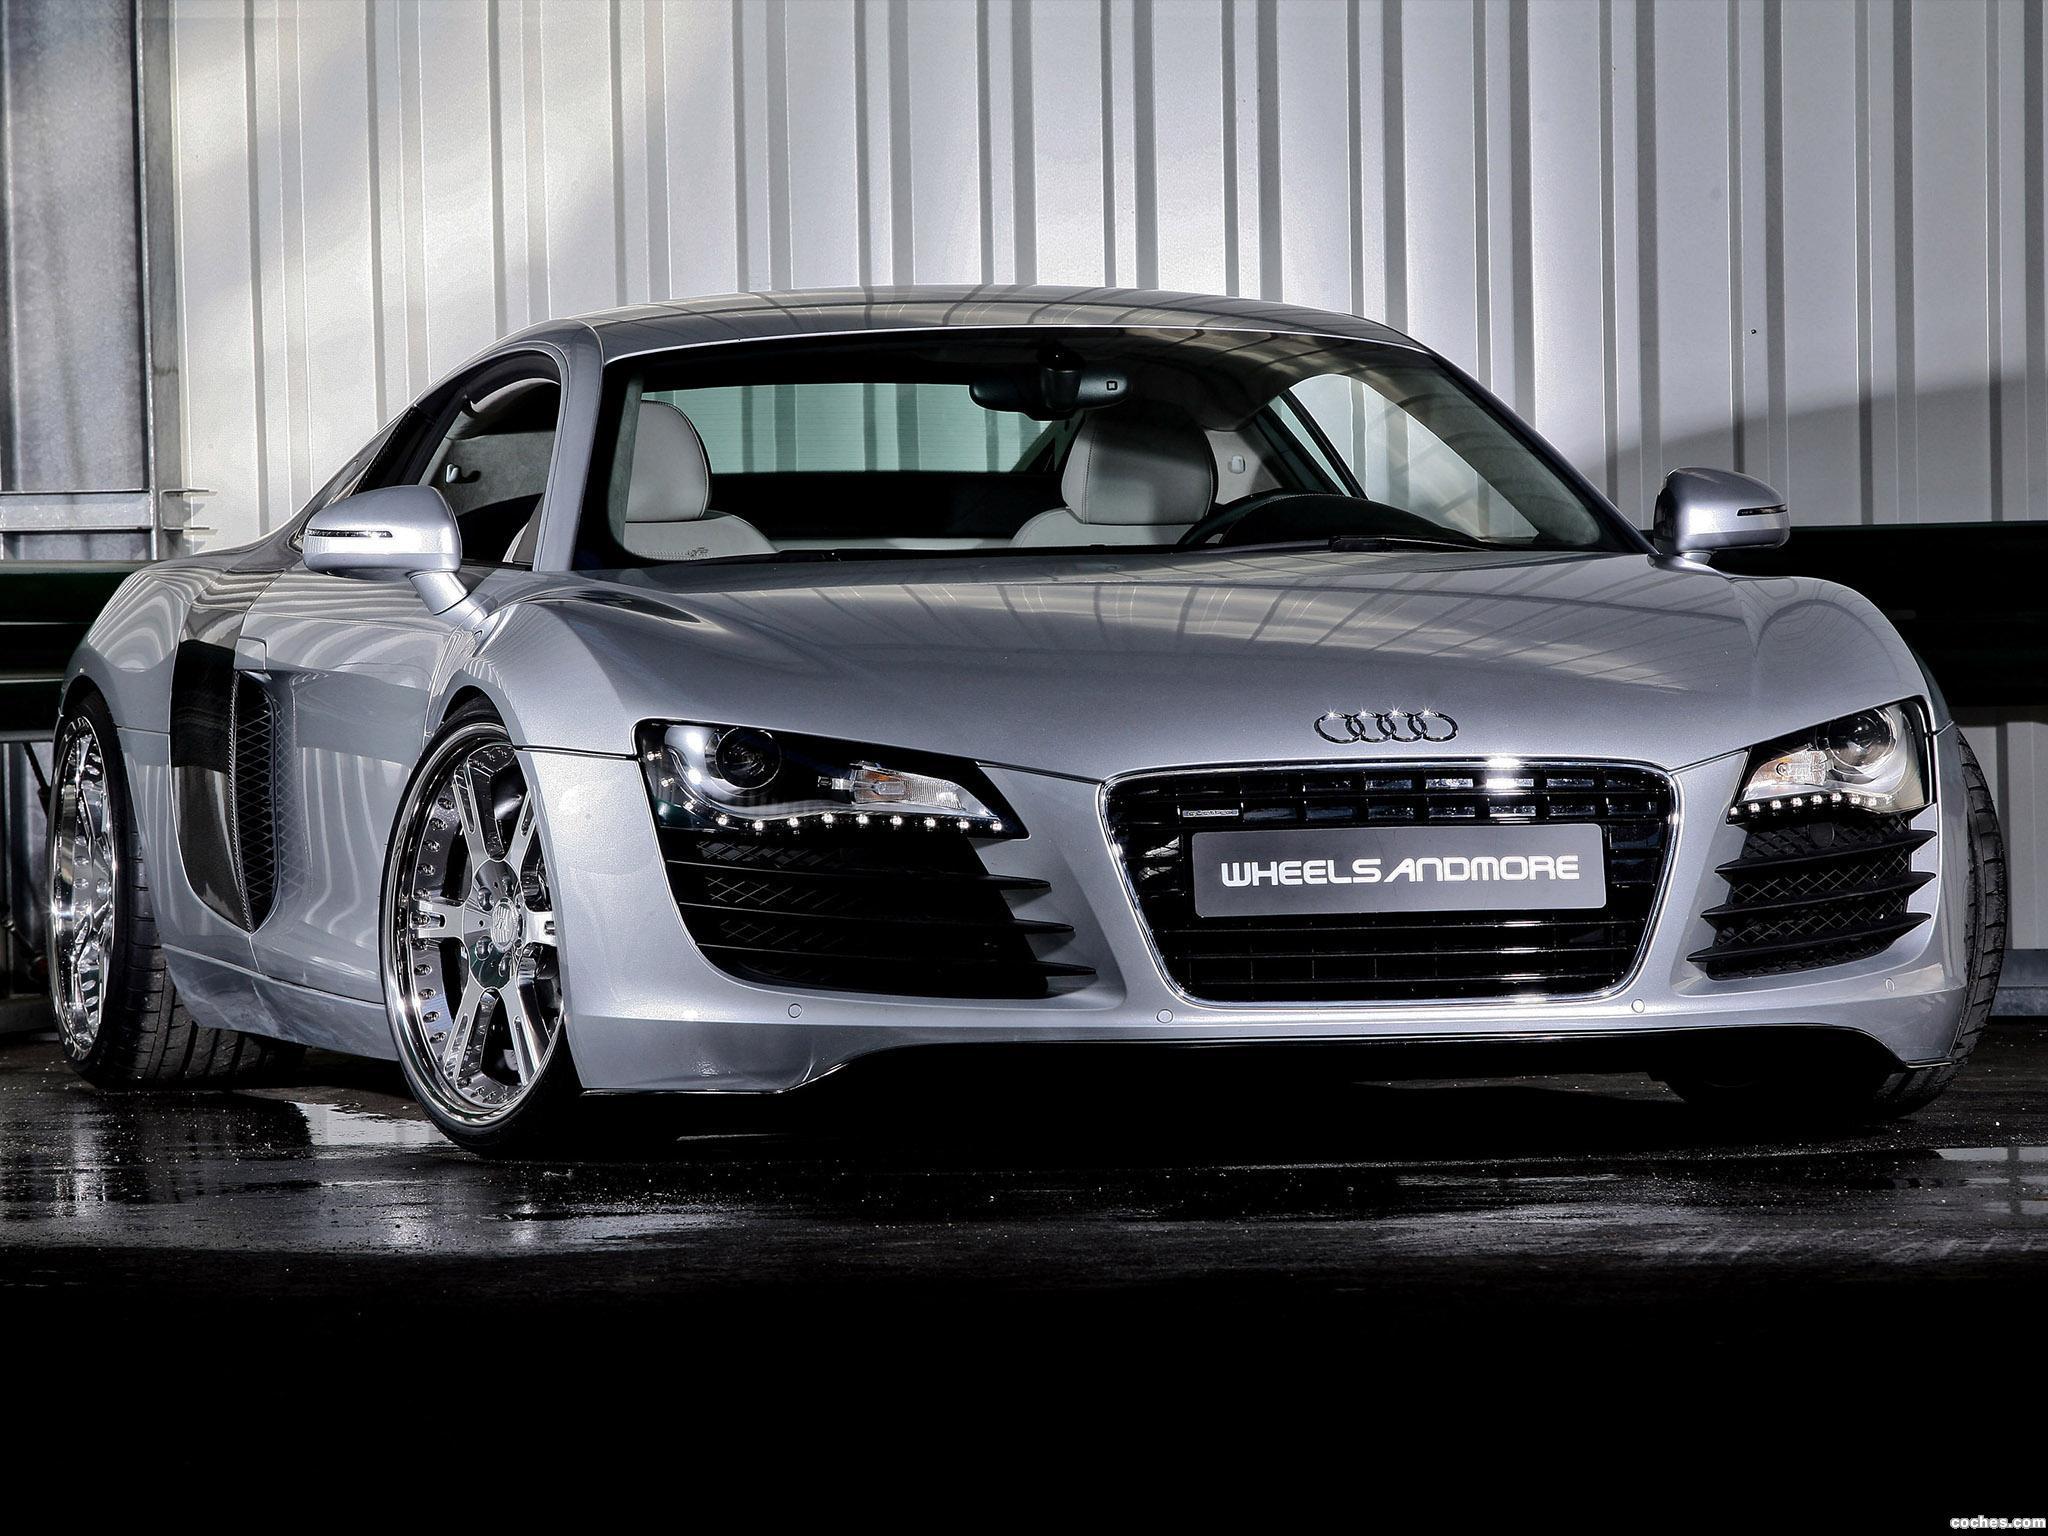 Foto 2 de Wheelsandmore Audi R8 2009